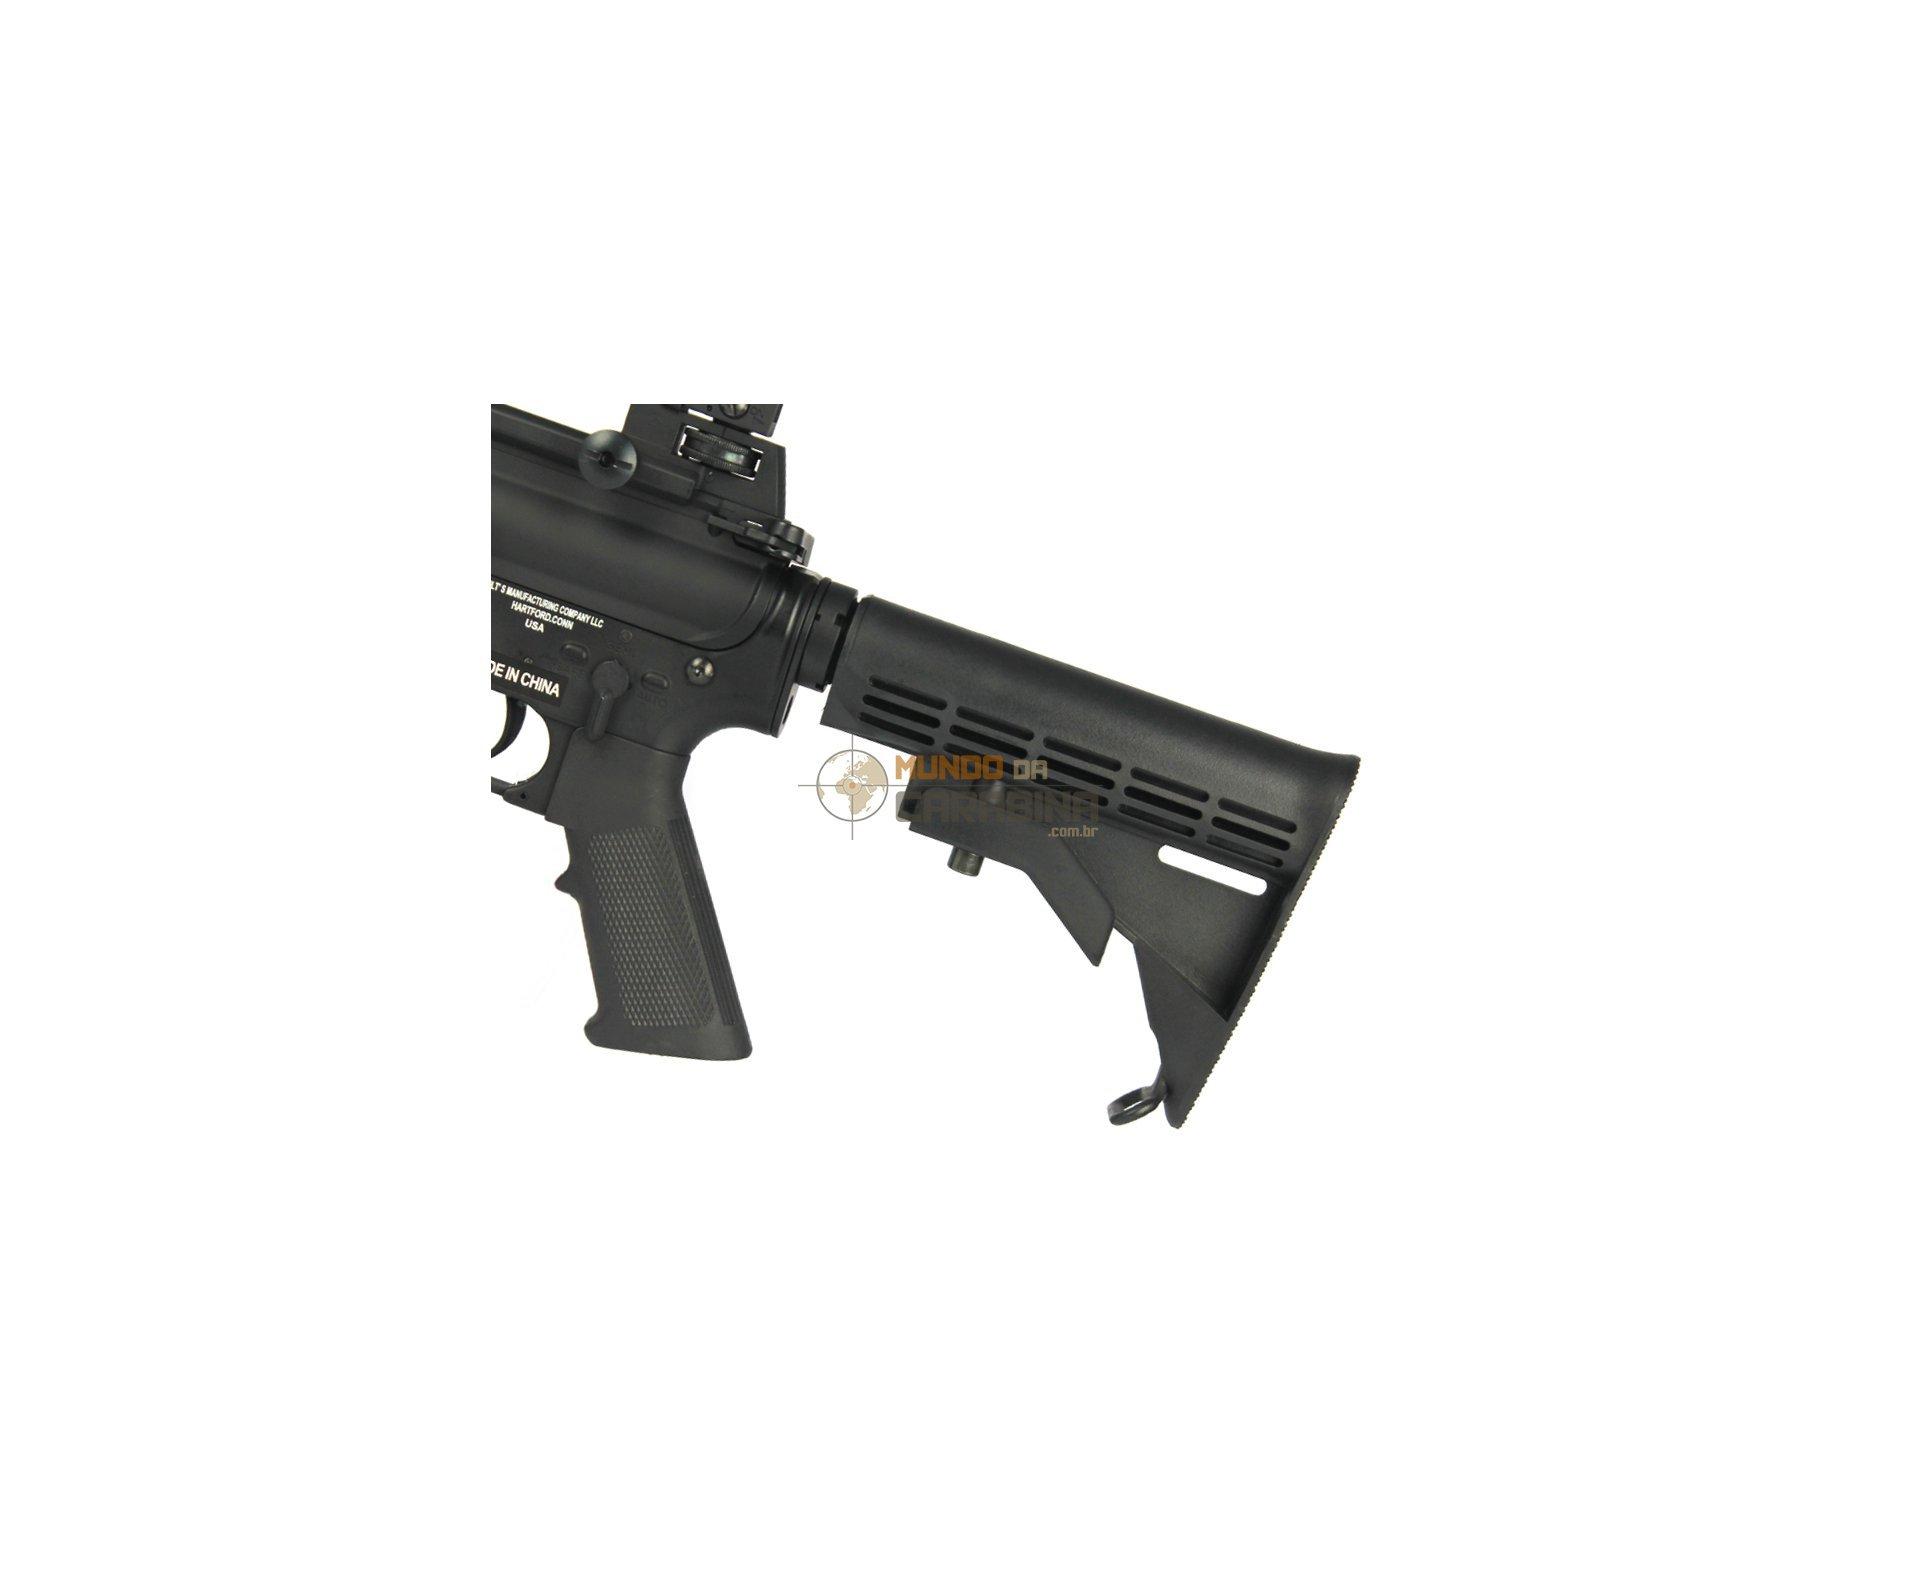 Rifle De Airsoft Colt M4a1 - Full Metal - Calibre 6,0 Mm - Cybergun